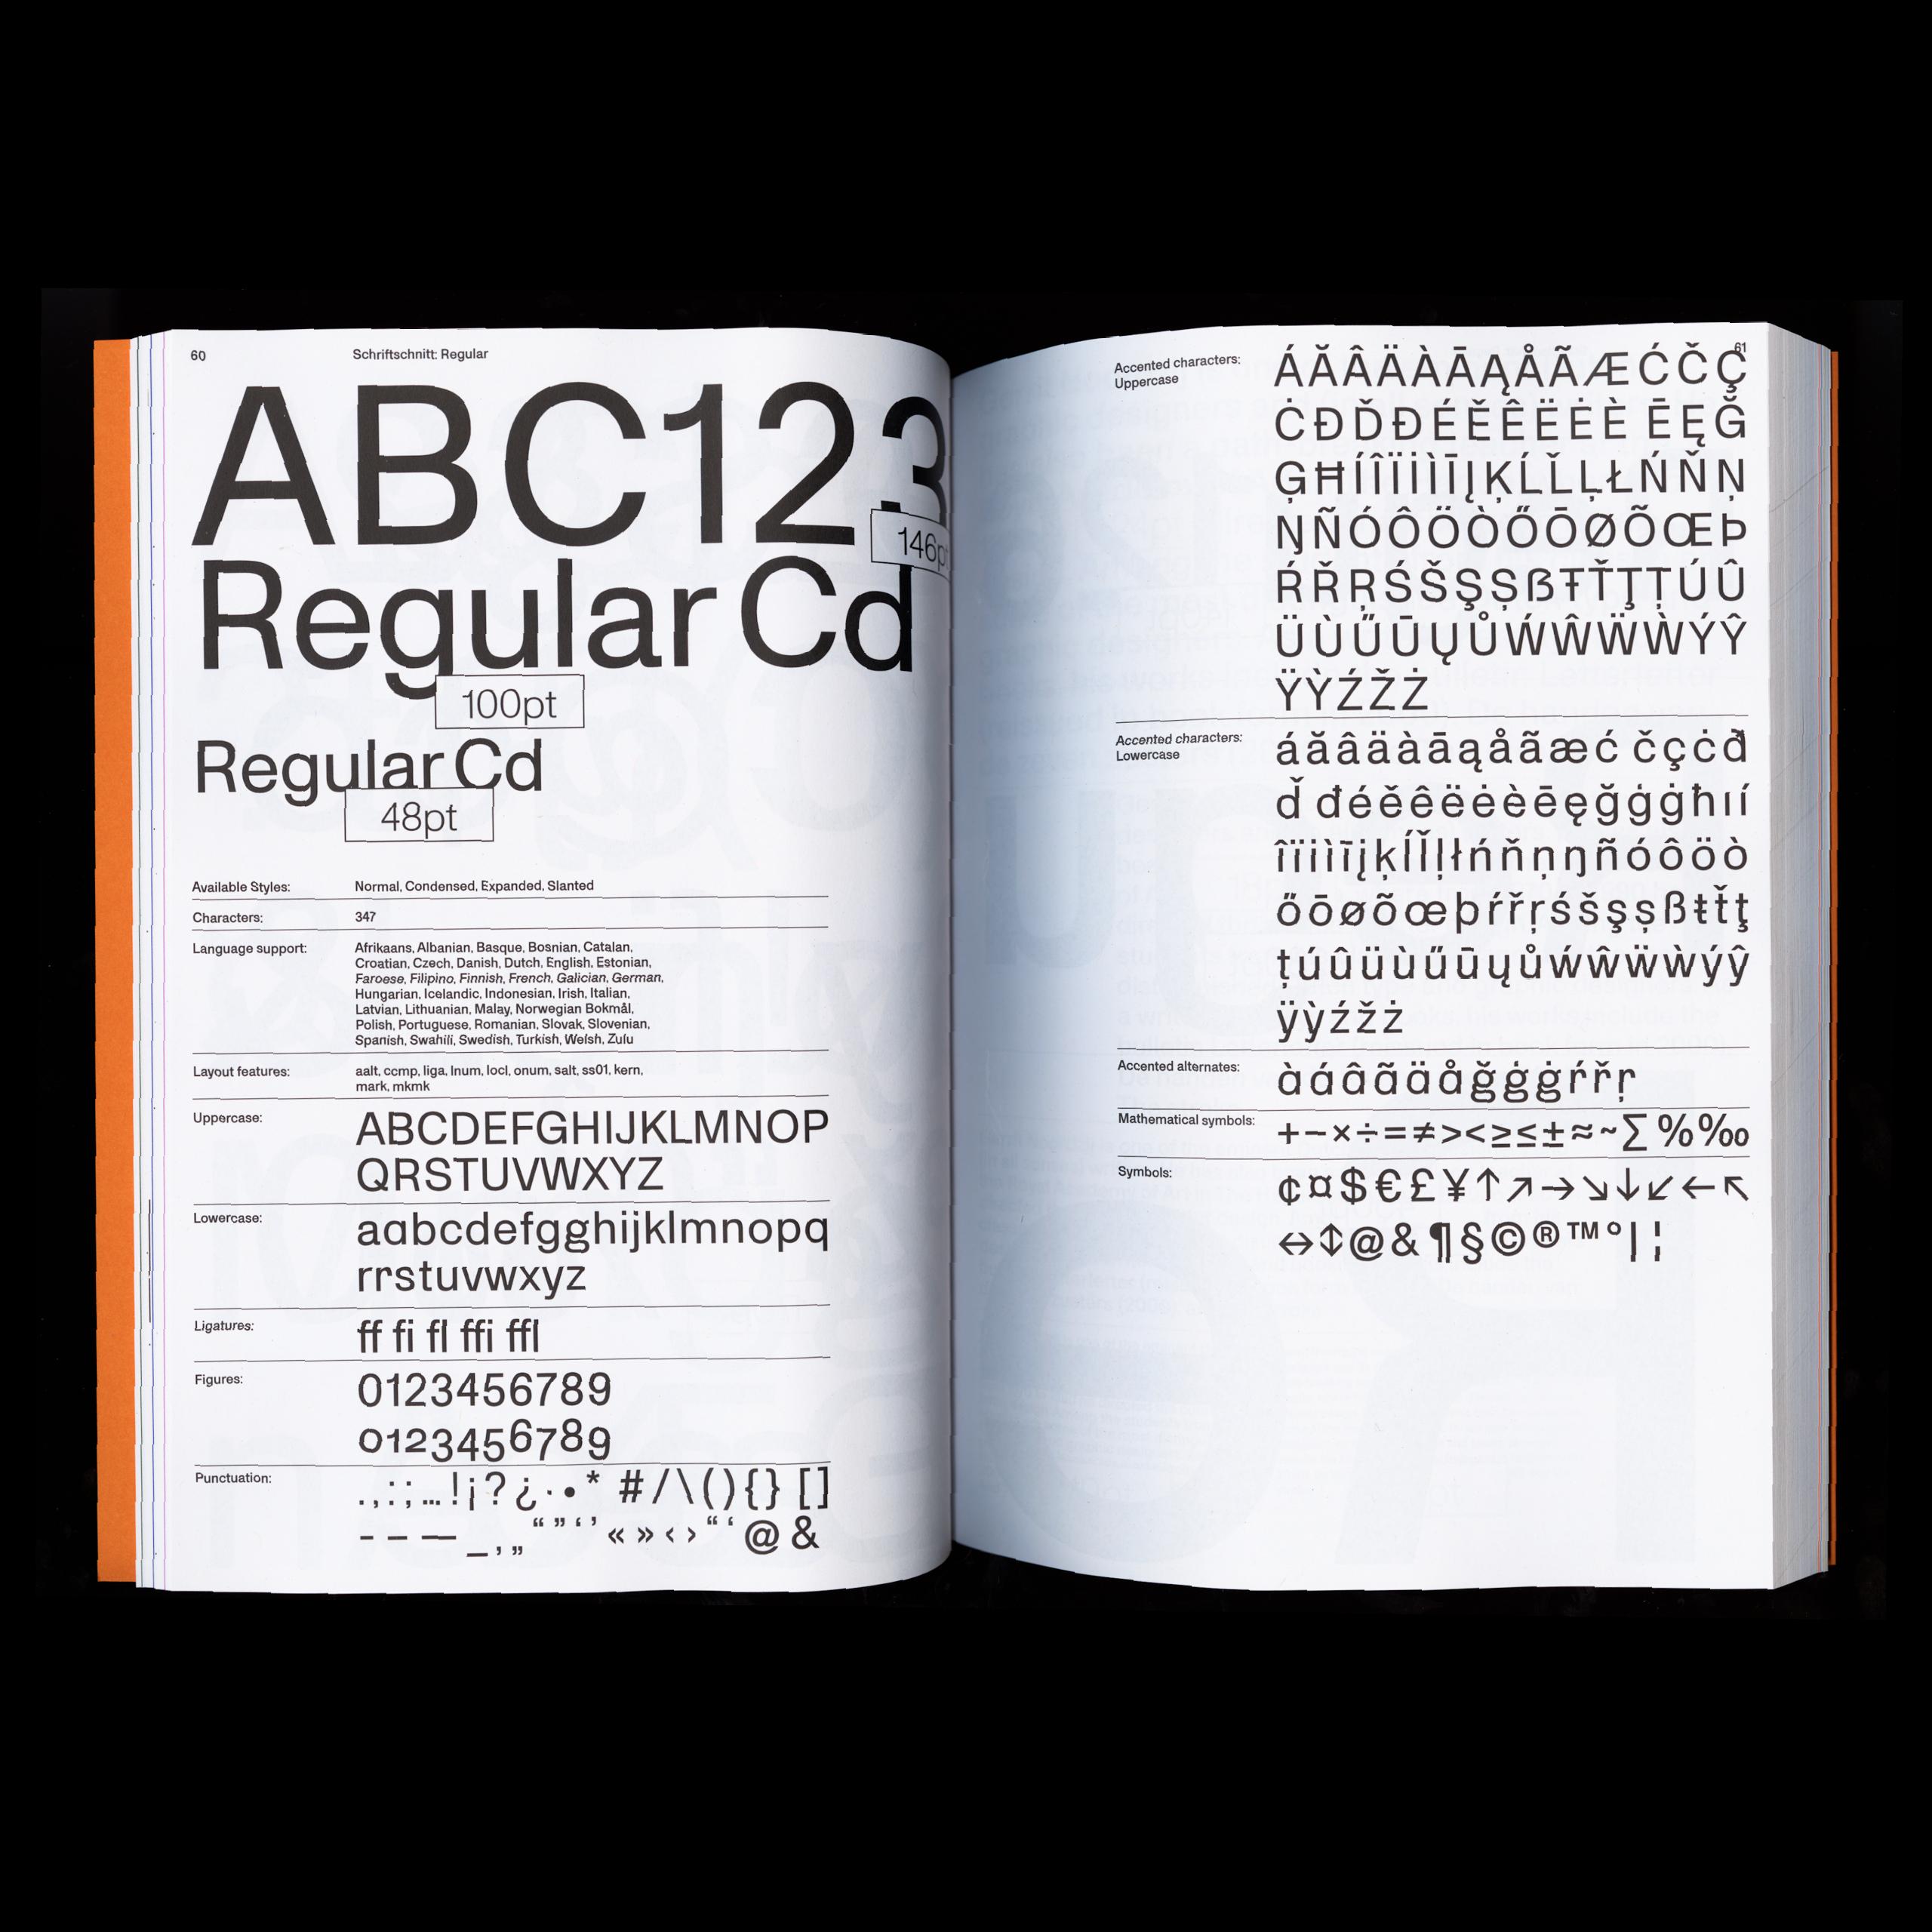 Daniel_Stuhlpfarrer_Spekulative-Schriftgestaltung-Speculative-Type-Design_WEB74